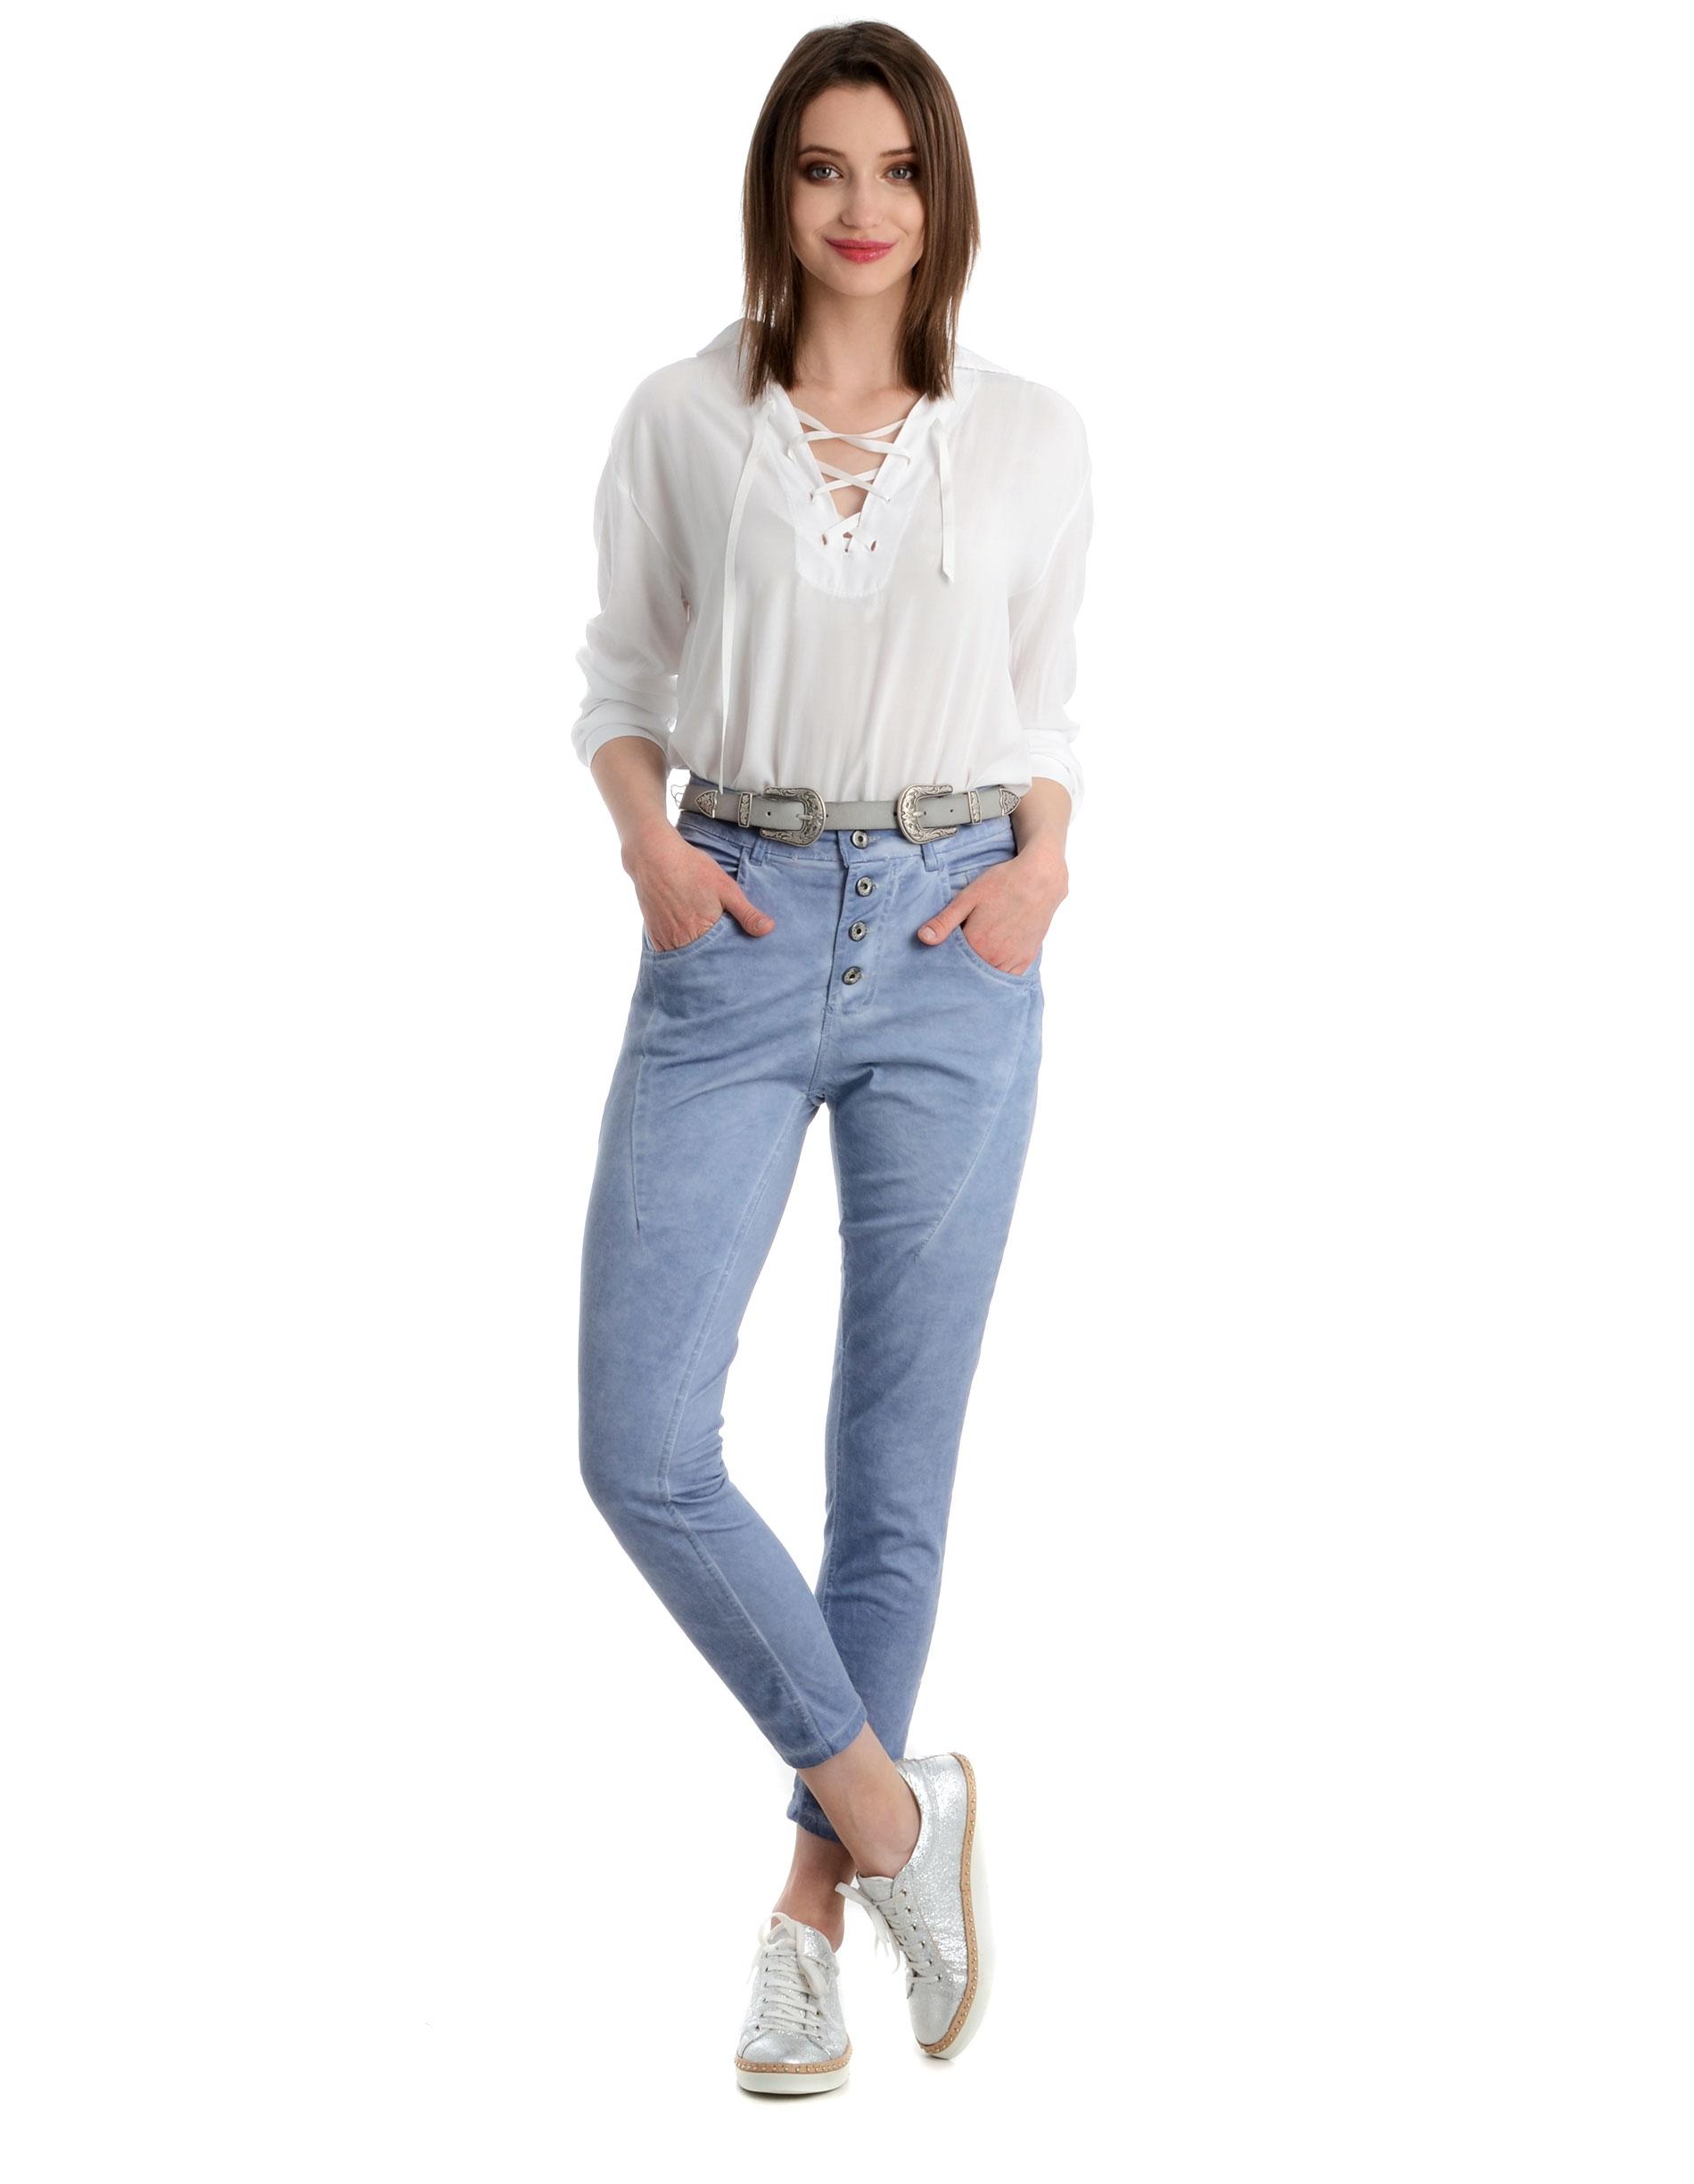 Spodnie - 146-168115 JE - Unisono